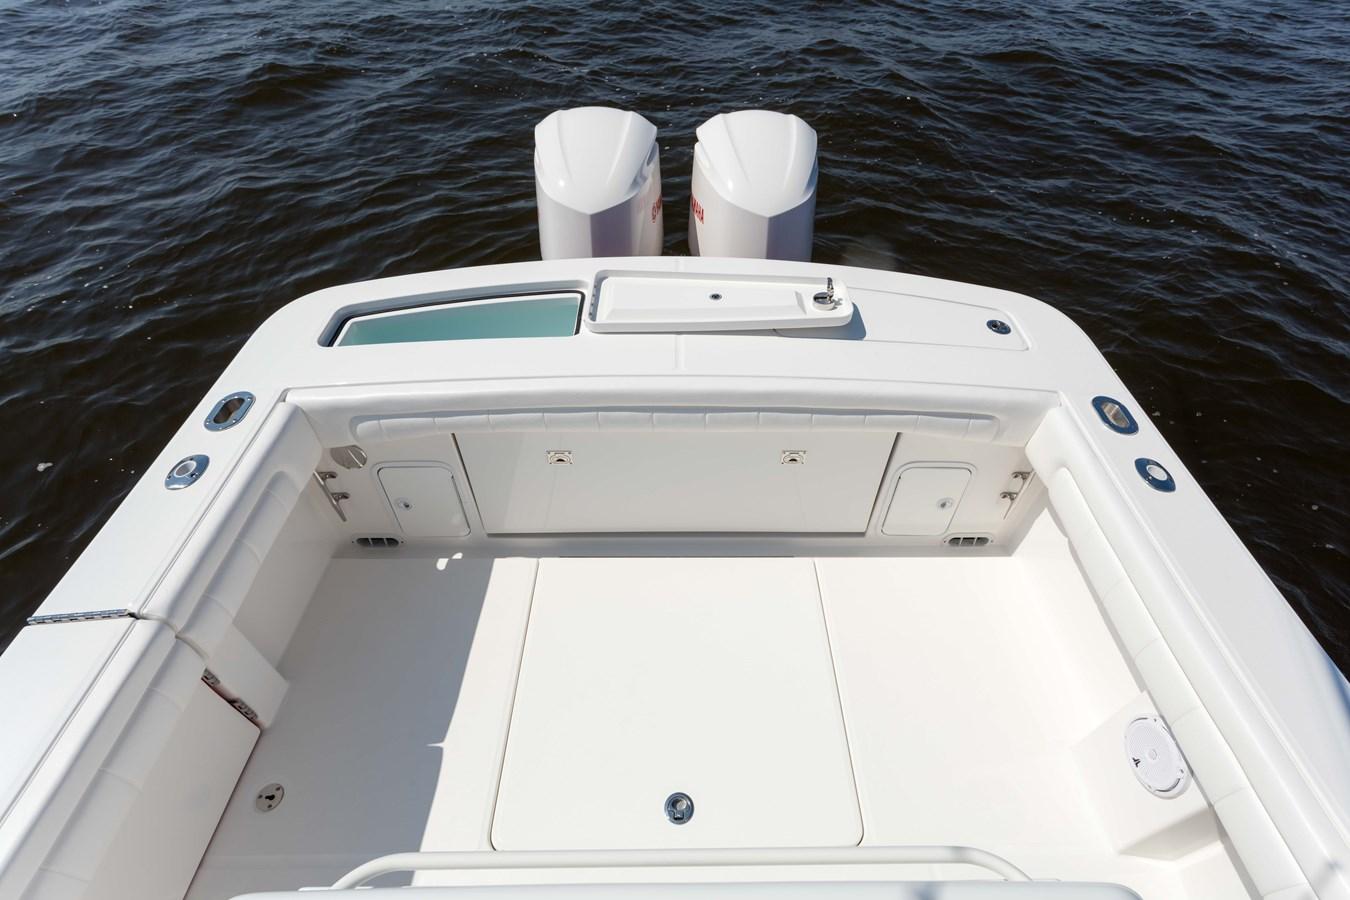 31-regulator-center-console-boat-transom-fishbox-yamaha-outboard - 31 REGULATOR For Sale